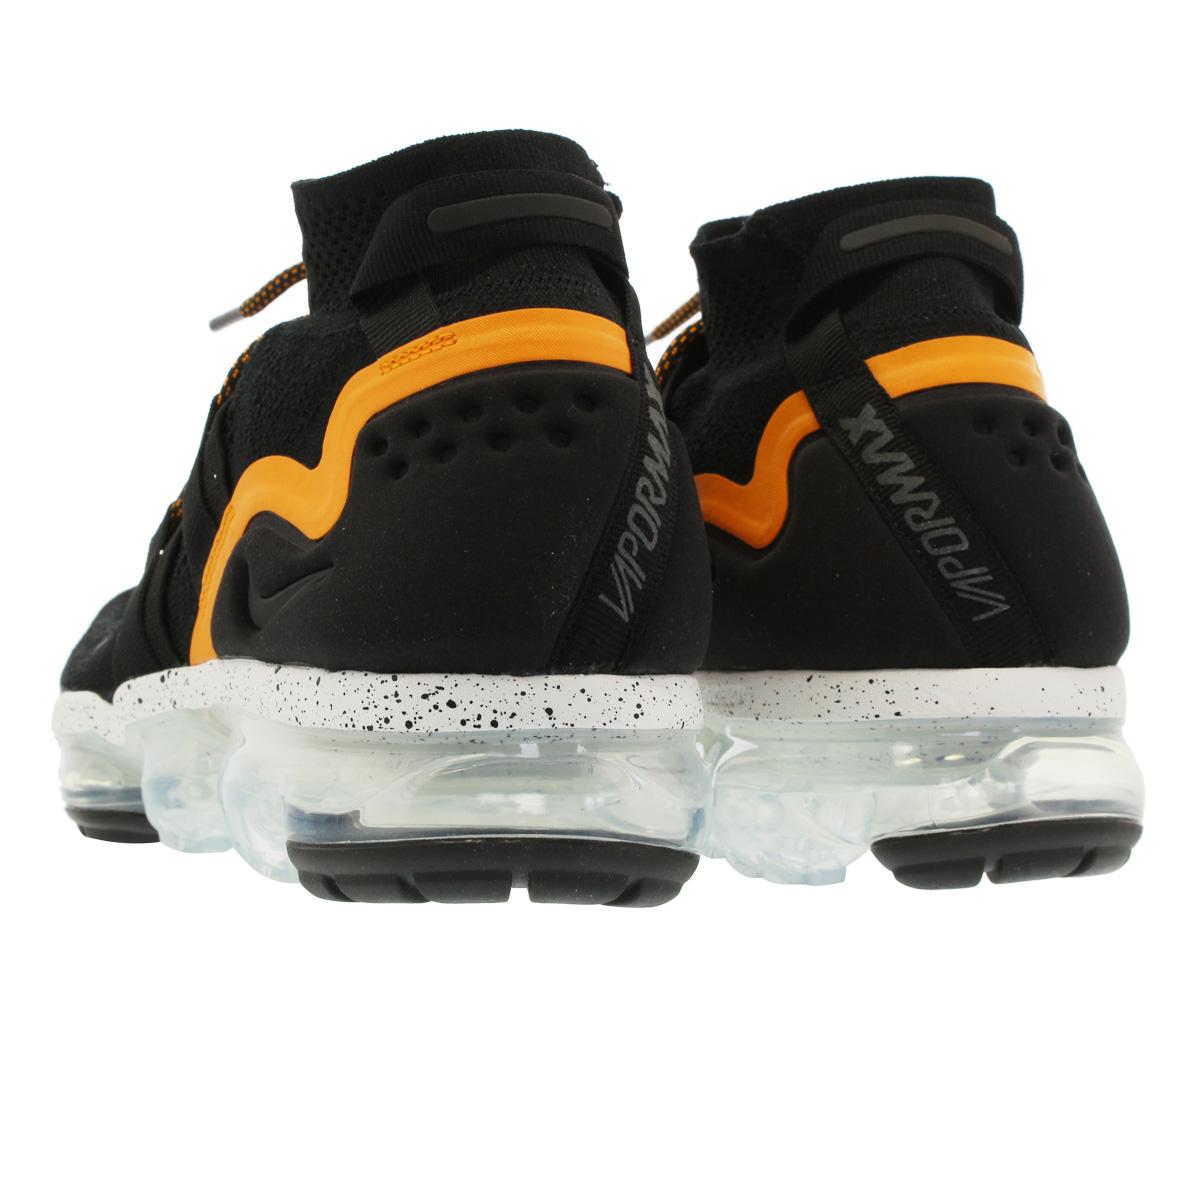 9e0048daa761 NIKE AIR VAPORMAX FLYKNIT UTILITY Nike vapor max fried food knit utility  BLACK ORANGE PEEL